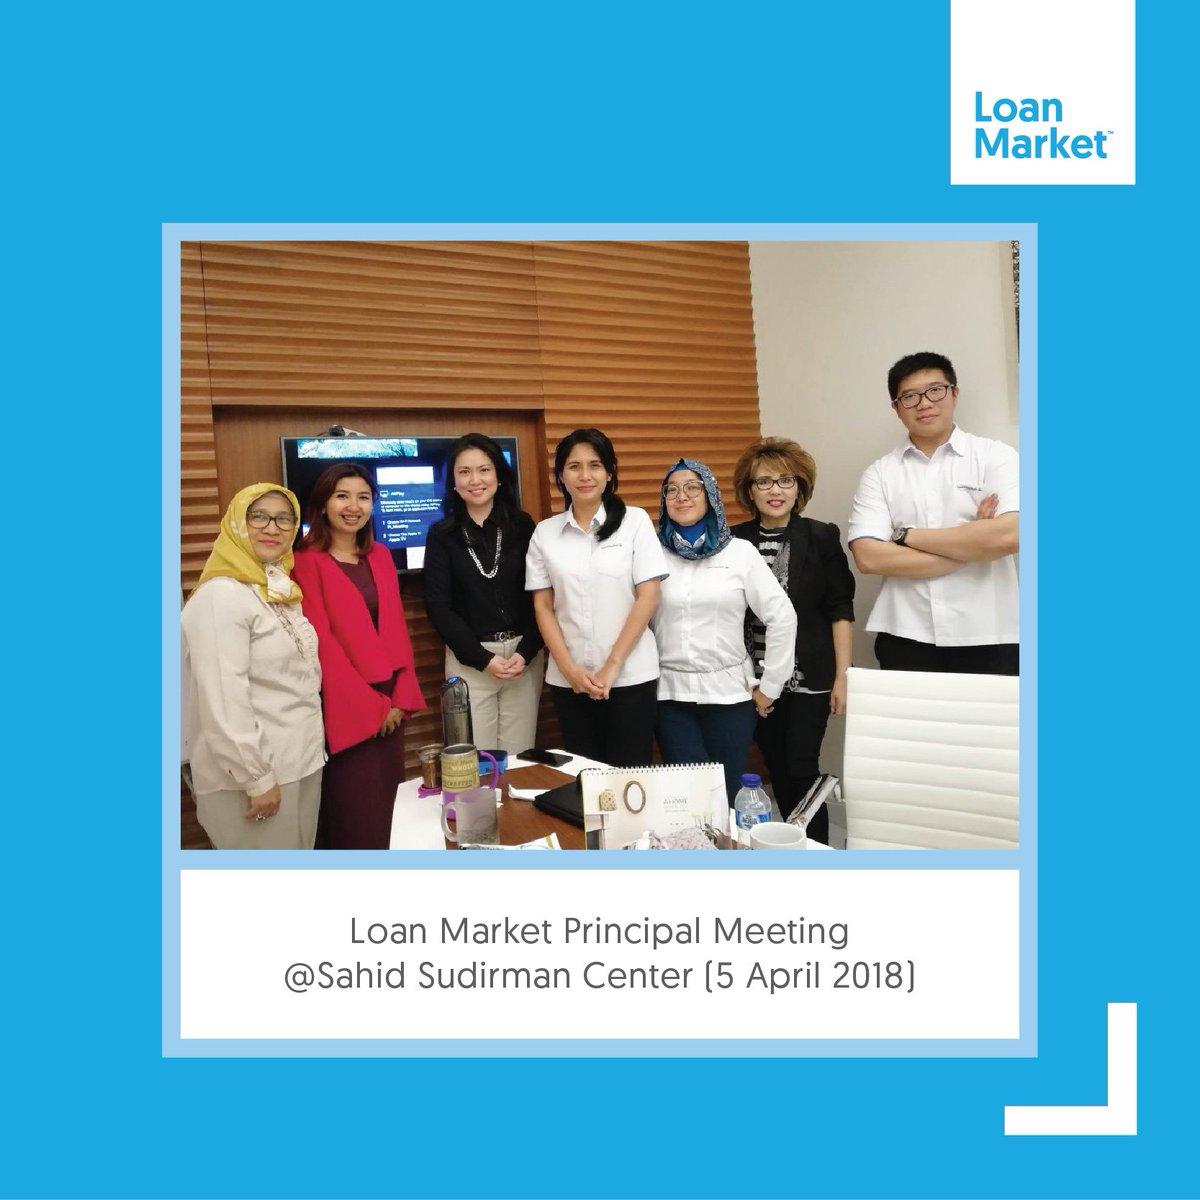 Loan Market Principal meeting @Sahid Sudirman Center (5 April 2018) . . . #loanmarketindonesia #loanmarket #loans #market #kpr #homeloans #finance #business #meeting #principal #professional #event #april#2018pic.twitter.com/HgqQJoqFLu